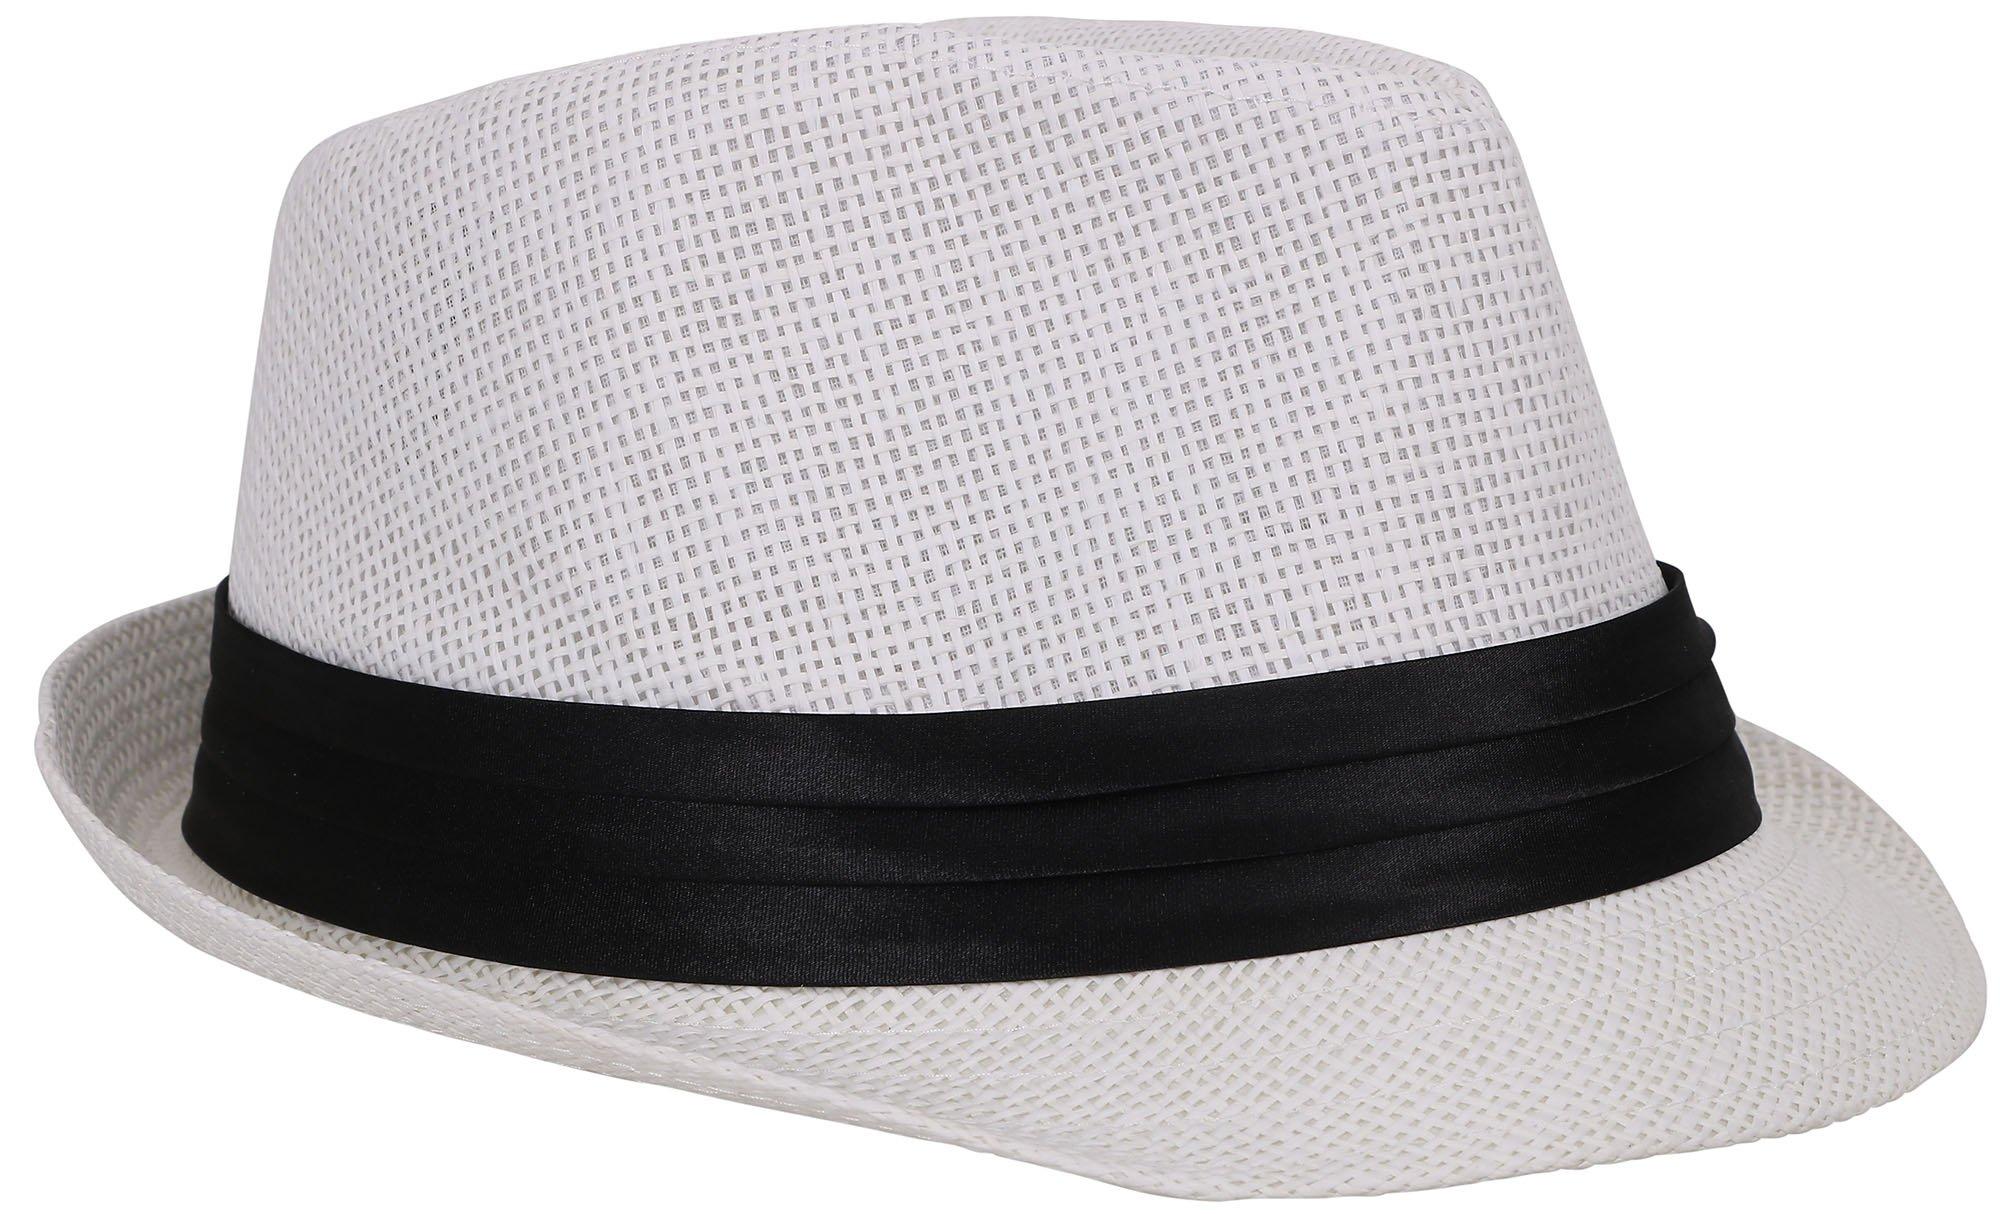 Verabella Beach Fedora Women/Men's Short Brim Straw Fedora Sun Hat,White,SM